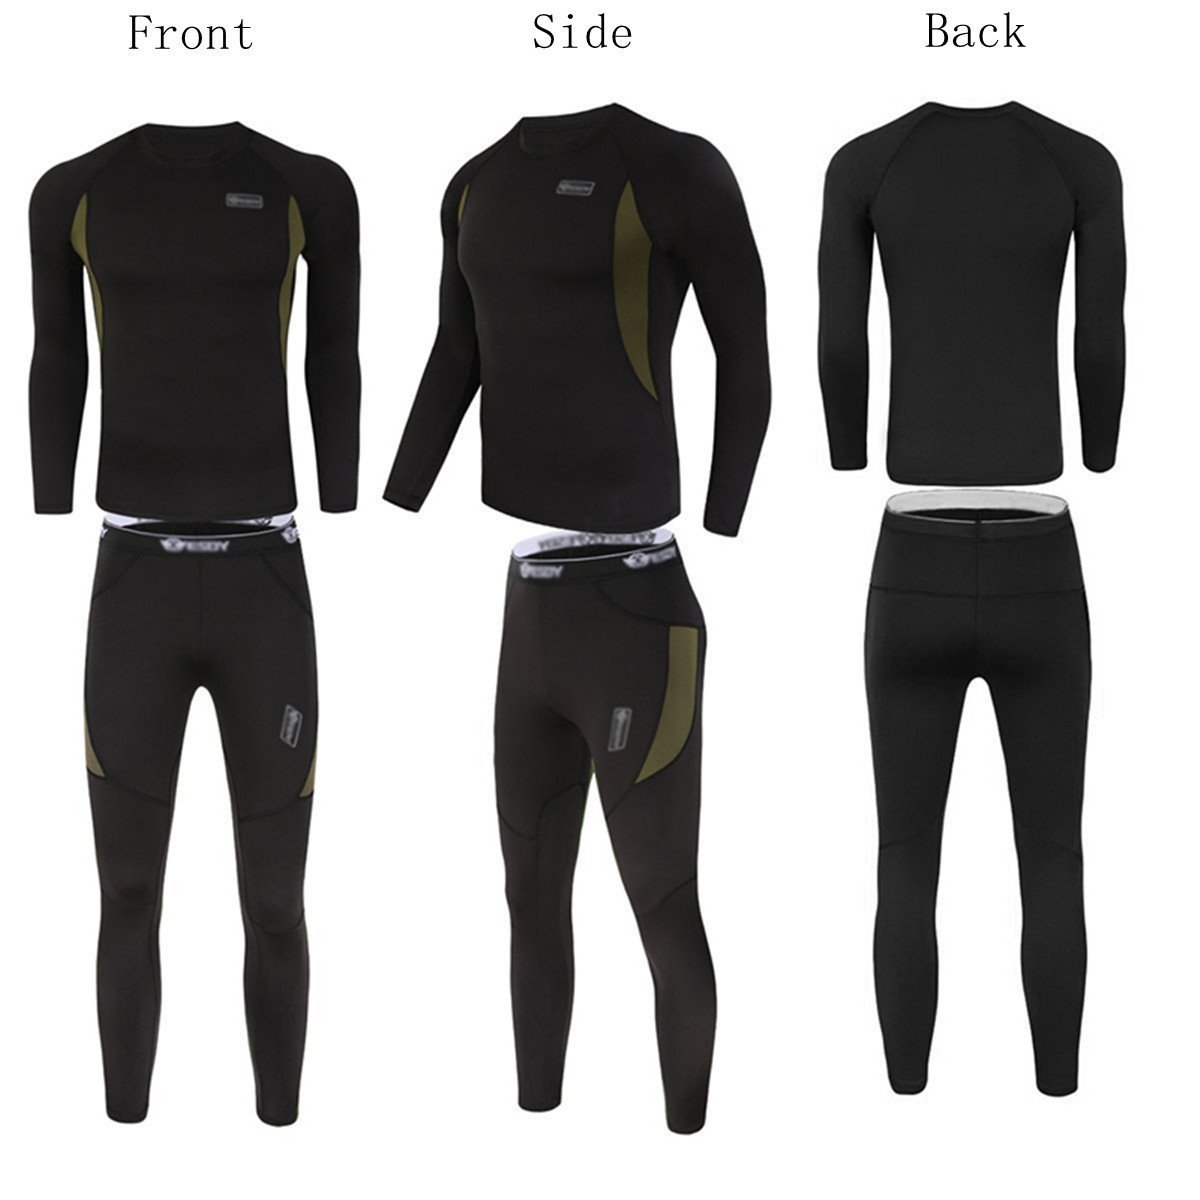 nero Set di biancheria intima termica da uomo Winter Suit Ski maniche lunghe maglia e mutandoni BLF XL